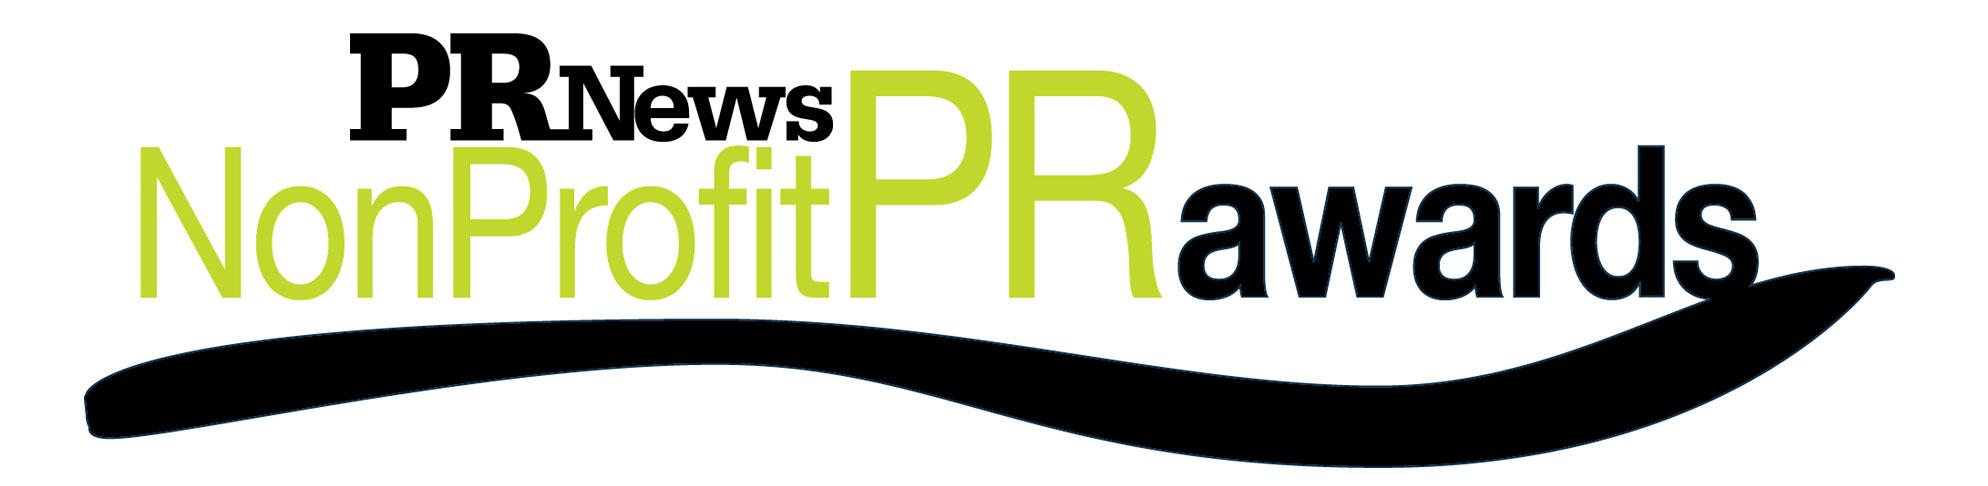 PR News Non Profit.jpg